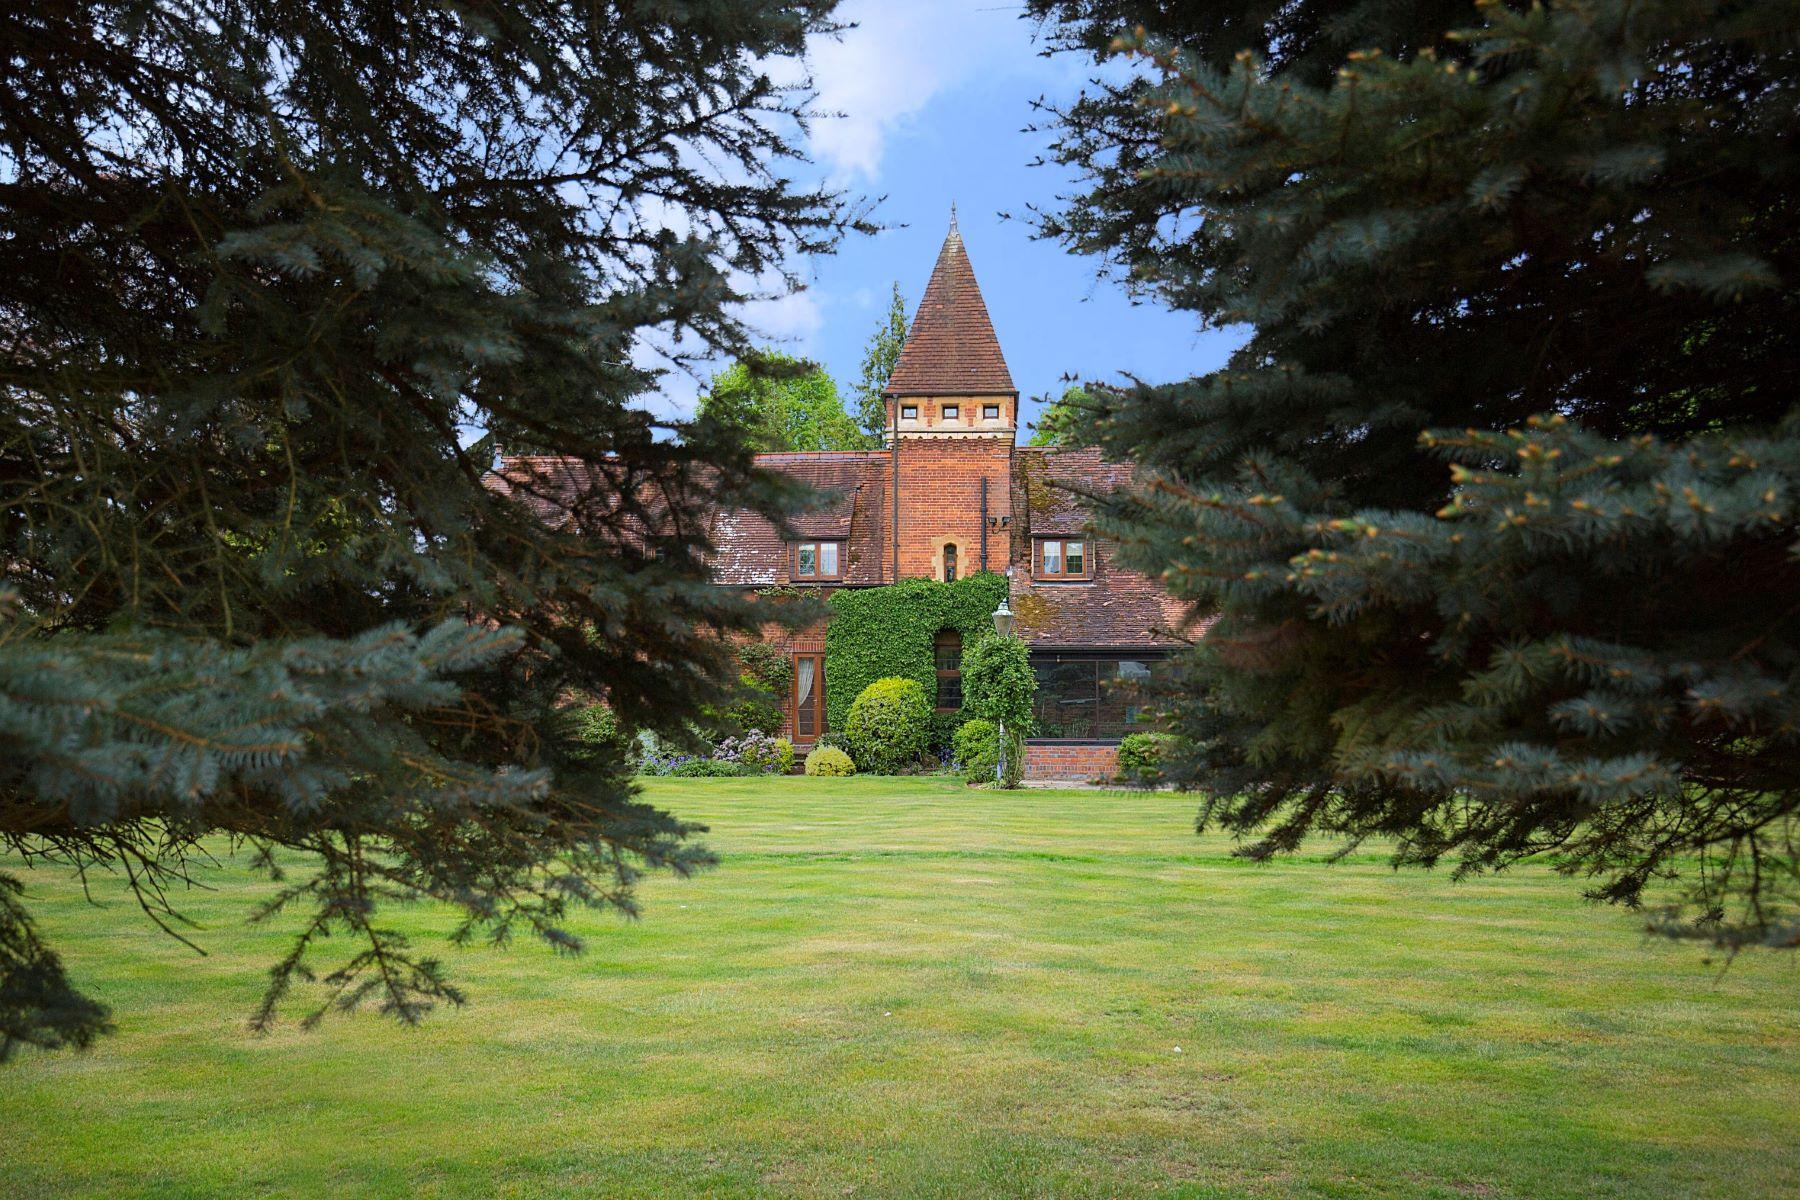 獨棟家庭住宅 為 出售 在 Sunningdale, Surrey Sunningdale, 英格蘭, 英國